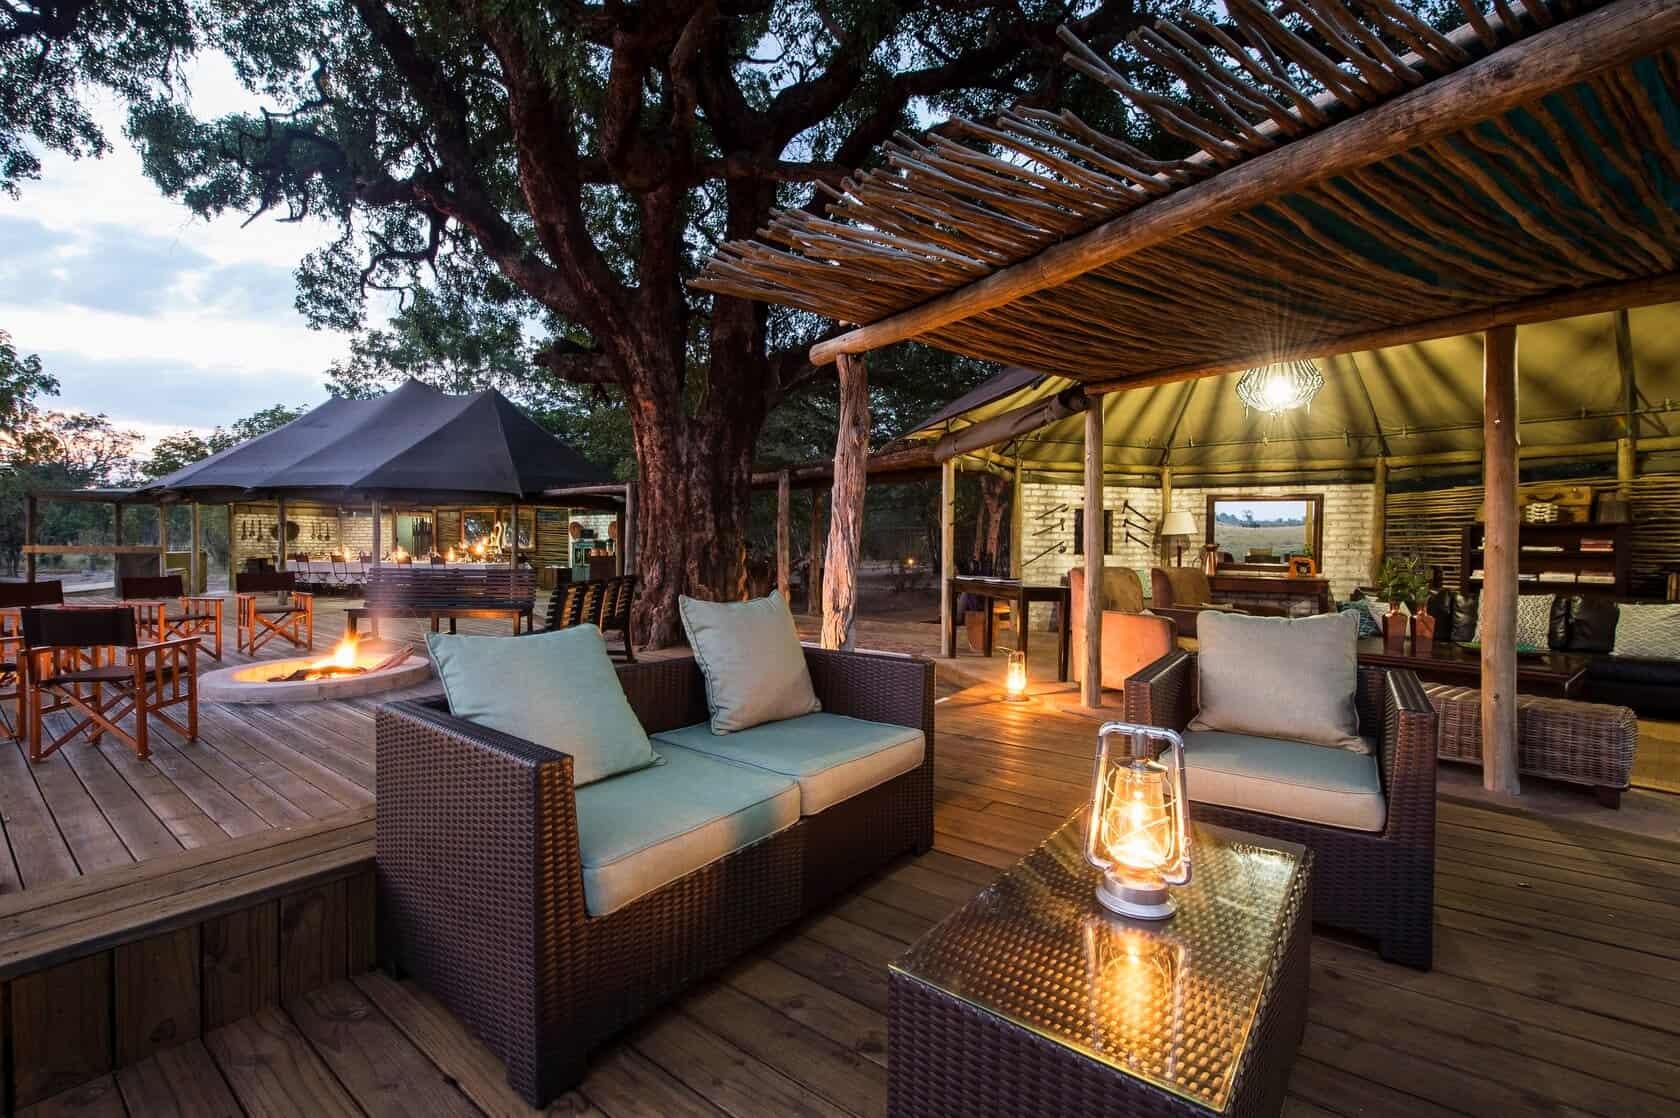 Tailormade-safaris-little-makalolo-hwange-zimbabwe2